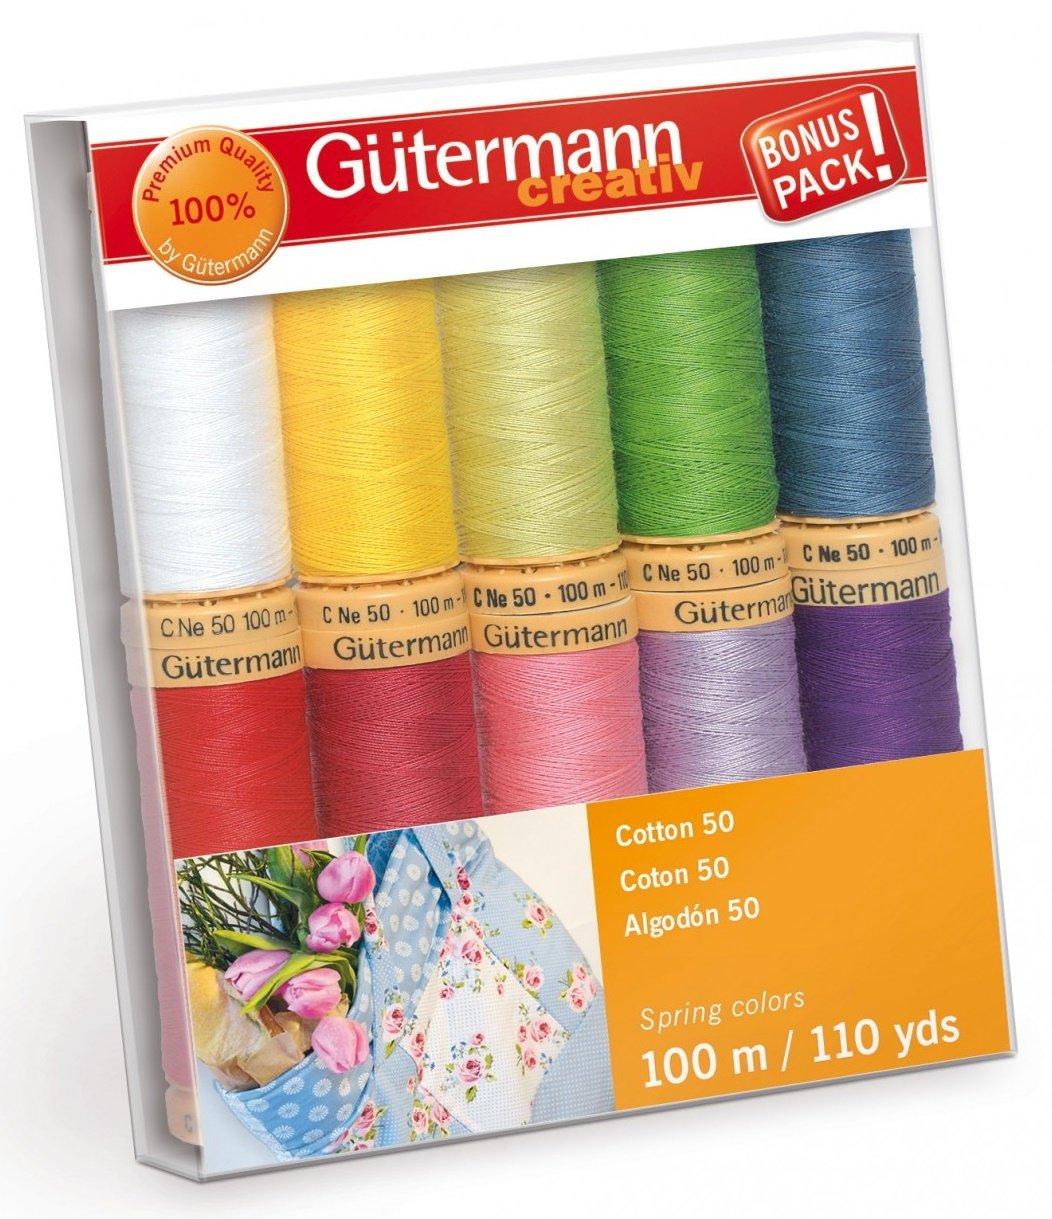 Gutermann Creativ Thread - 734016-1 Spring Cotton 50 - 10 Spools/10 Colors